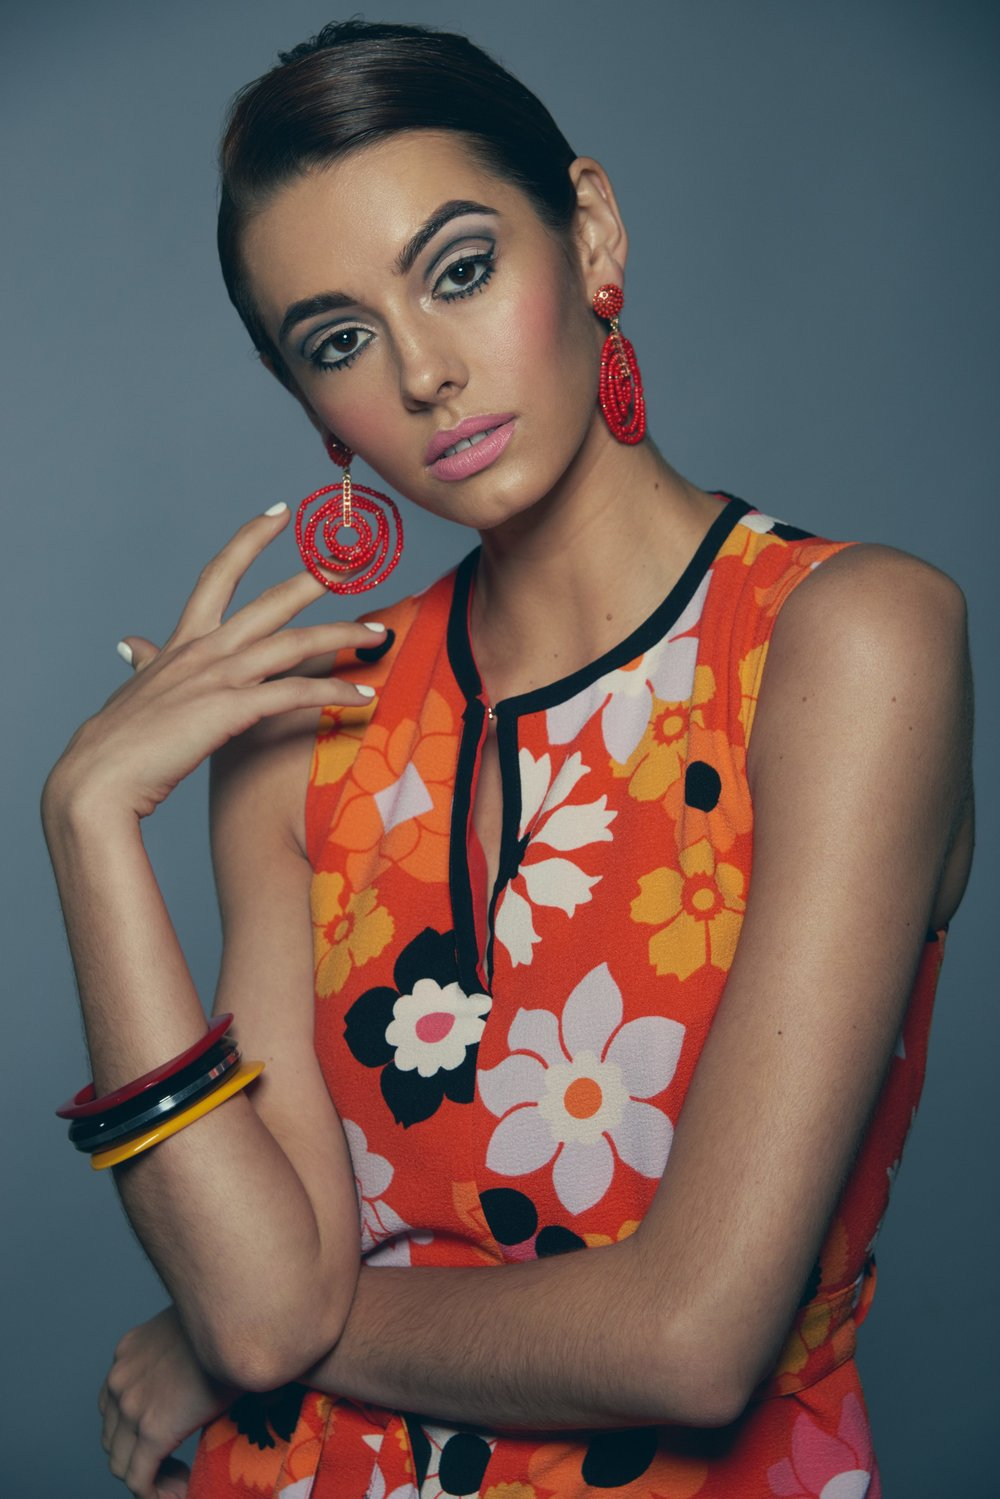 Makeup & Hair: Micaela / Photography: Michael Woodward / Model: Victoris Toland of Kingsley Model & Talent Agency / Sylist: Allison Strang